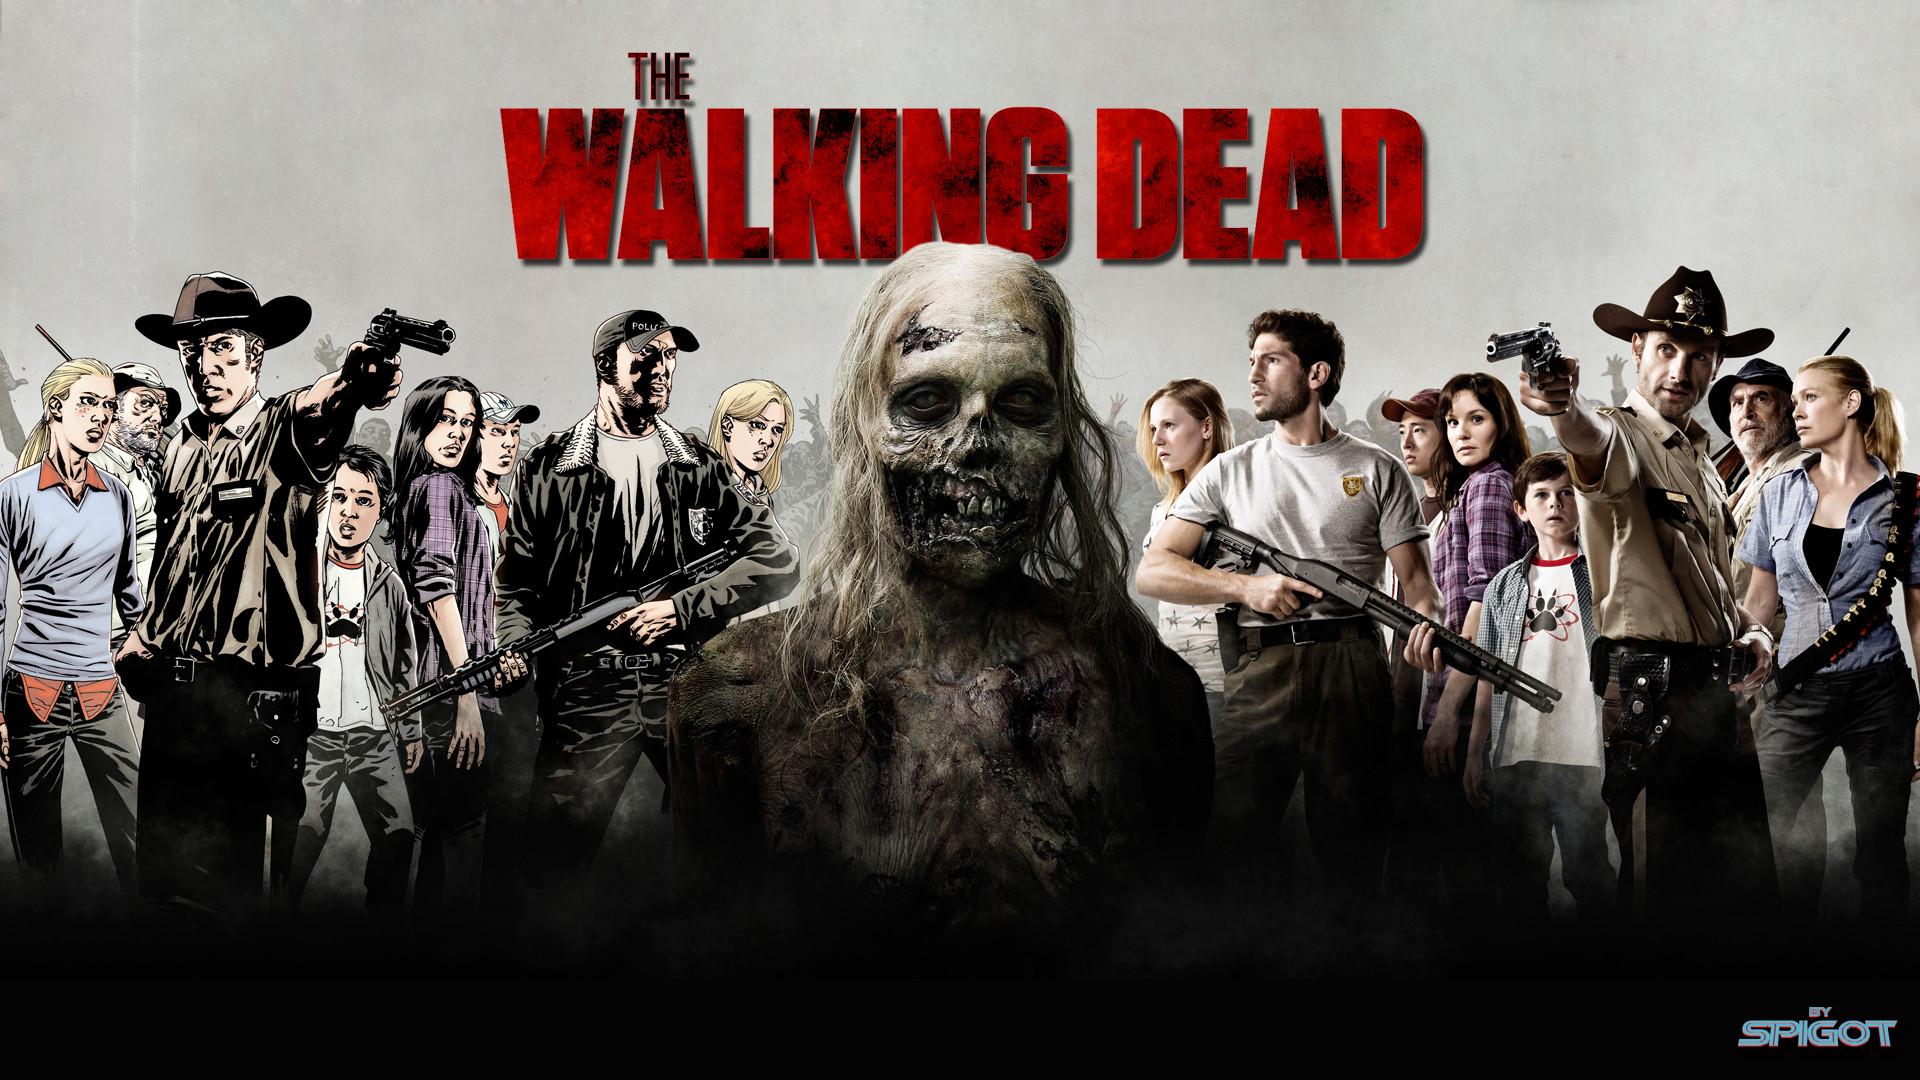 The Walking Dead HD Wallpapers for desktop download